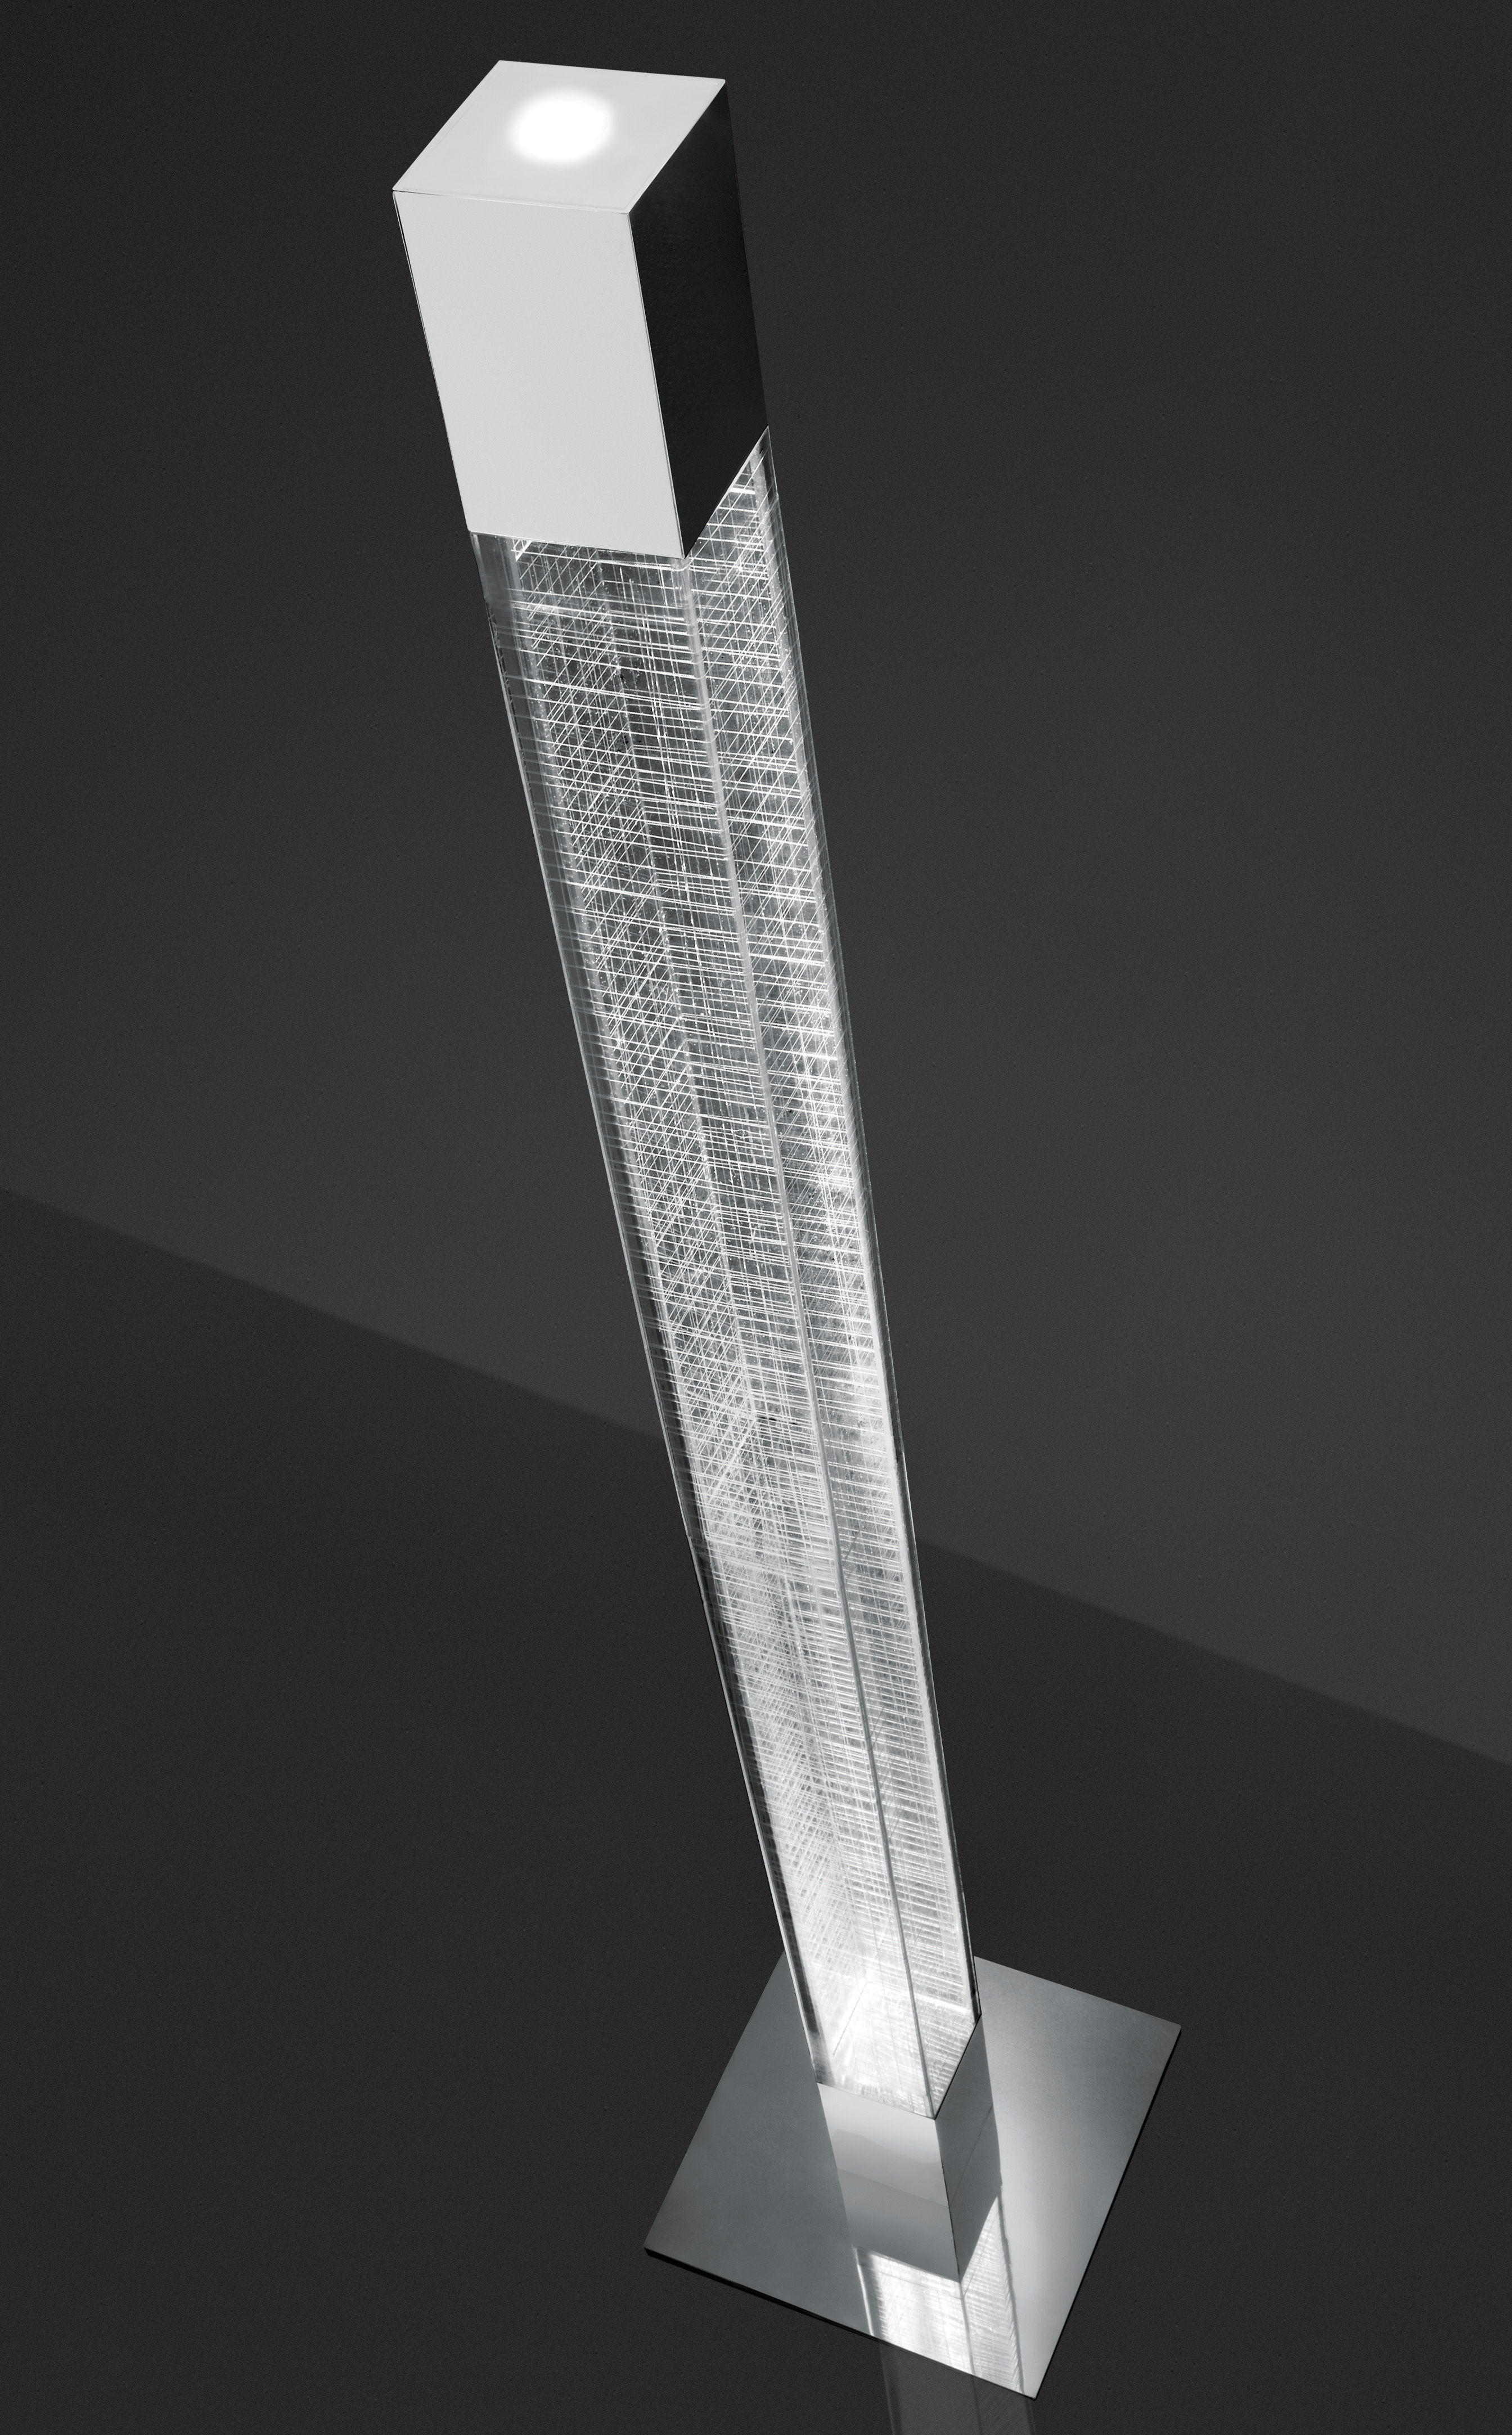 lampadaire mimesi led h 180 cm transparent quadrillage blanc artemide. Black Bedroom Furniture Sets. Home Design Ideas